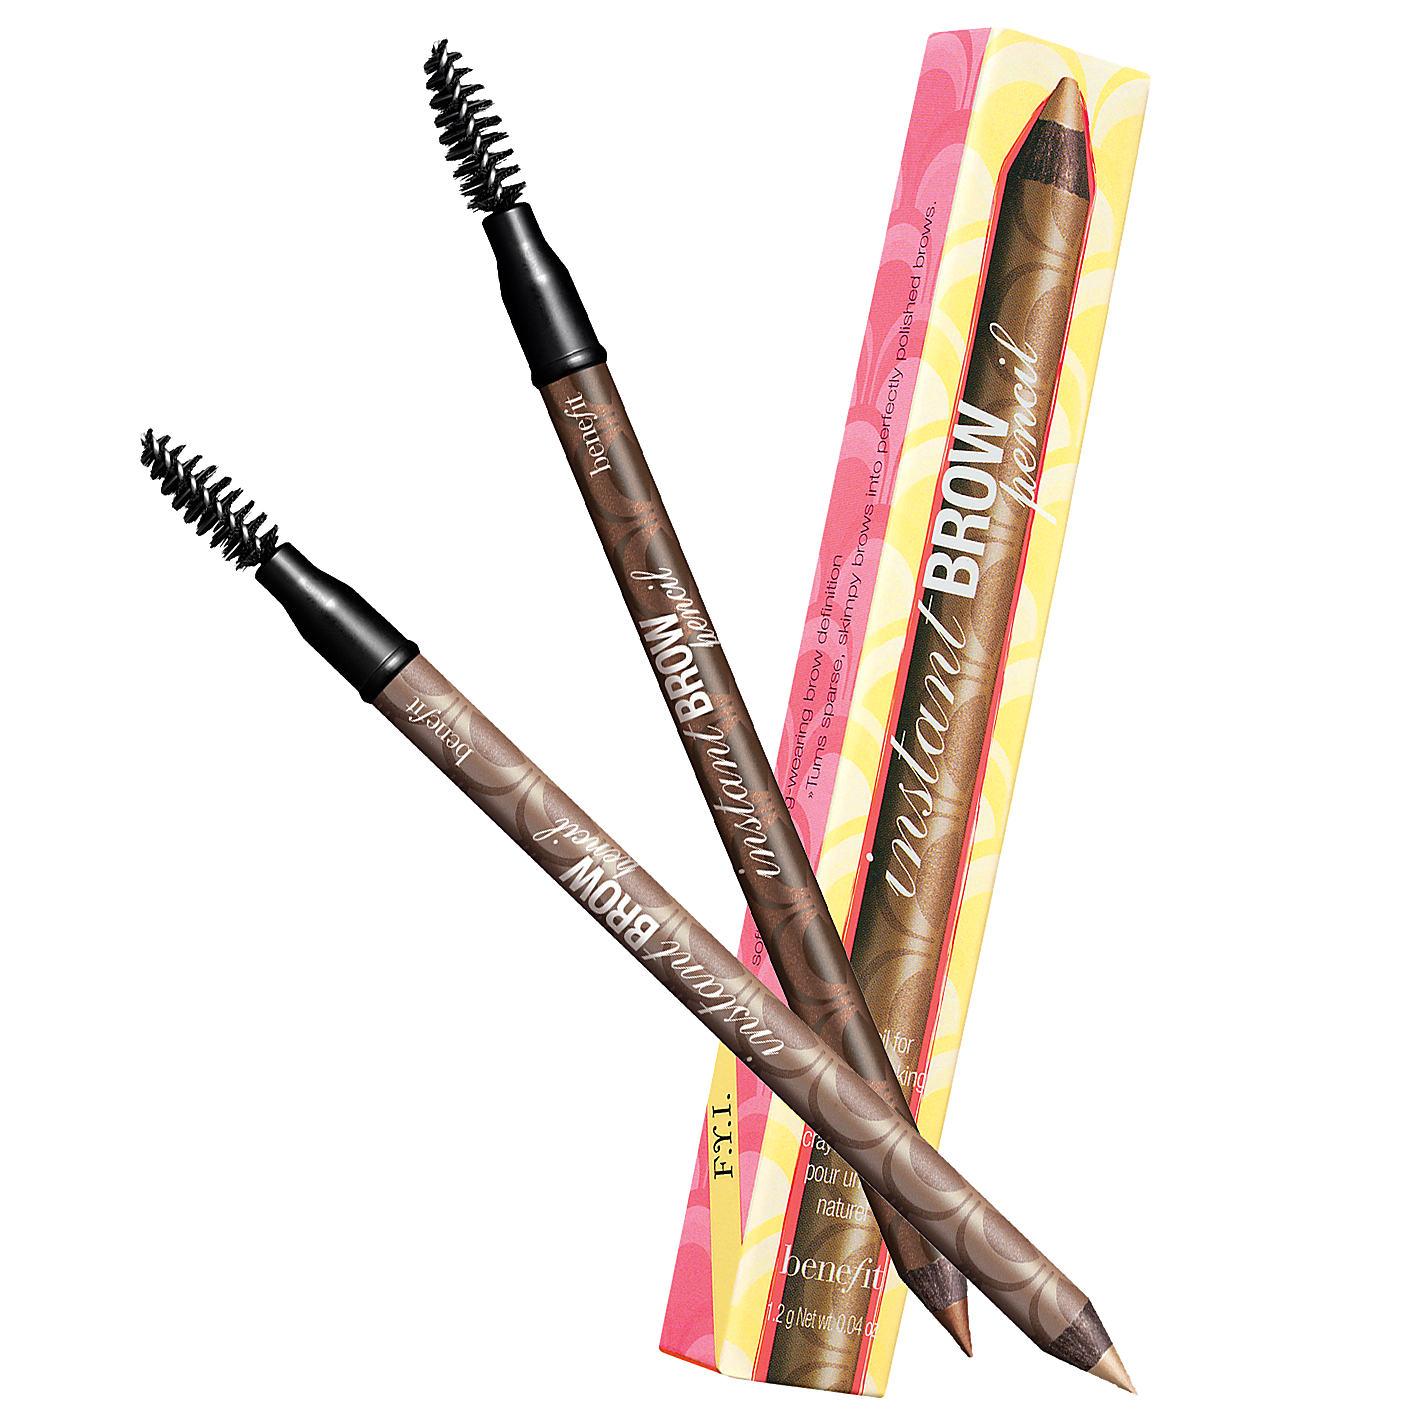 Benefit Instant Brow pencil